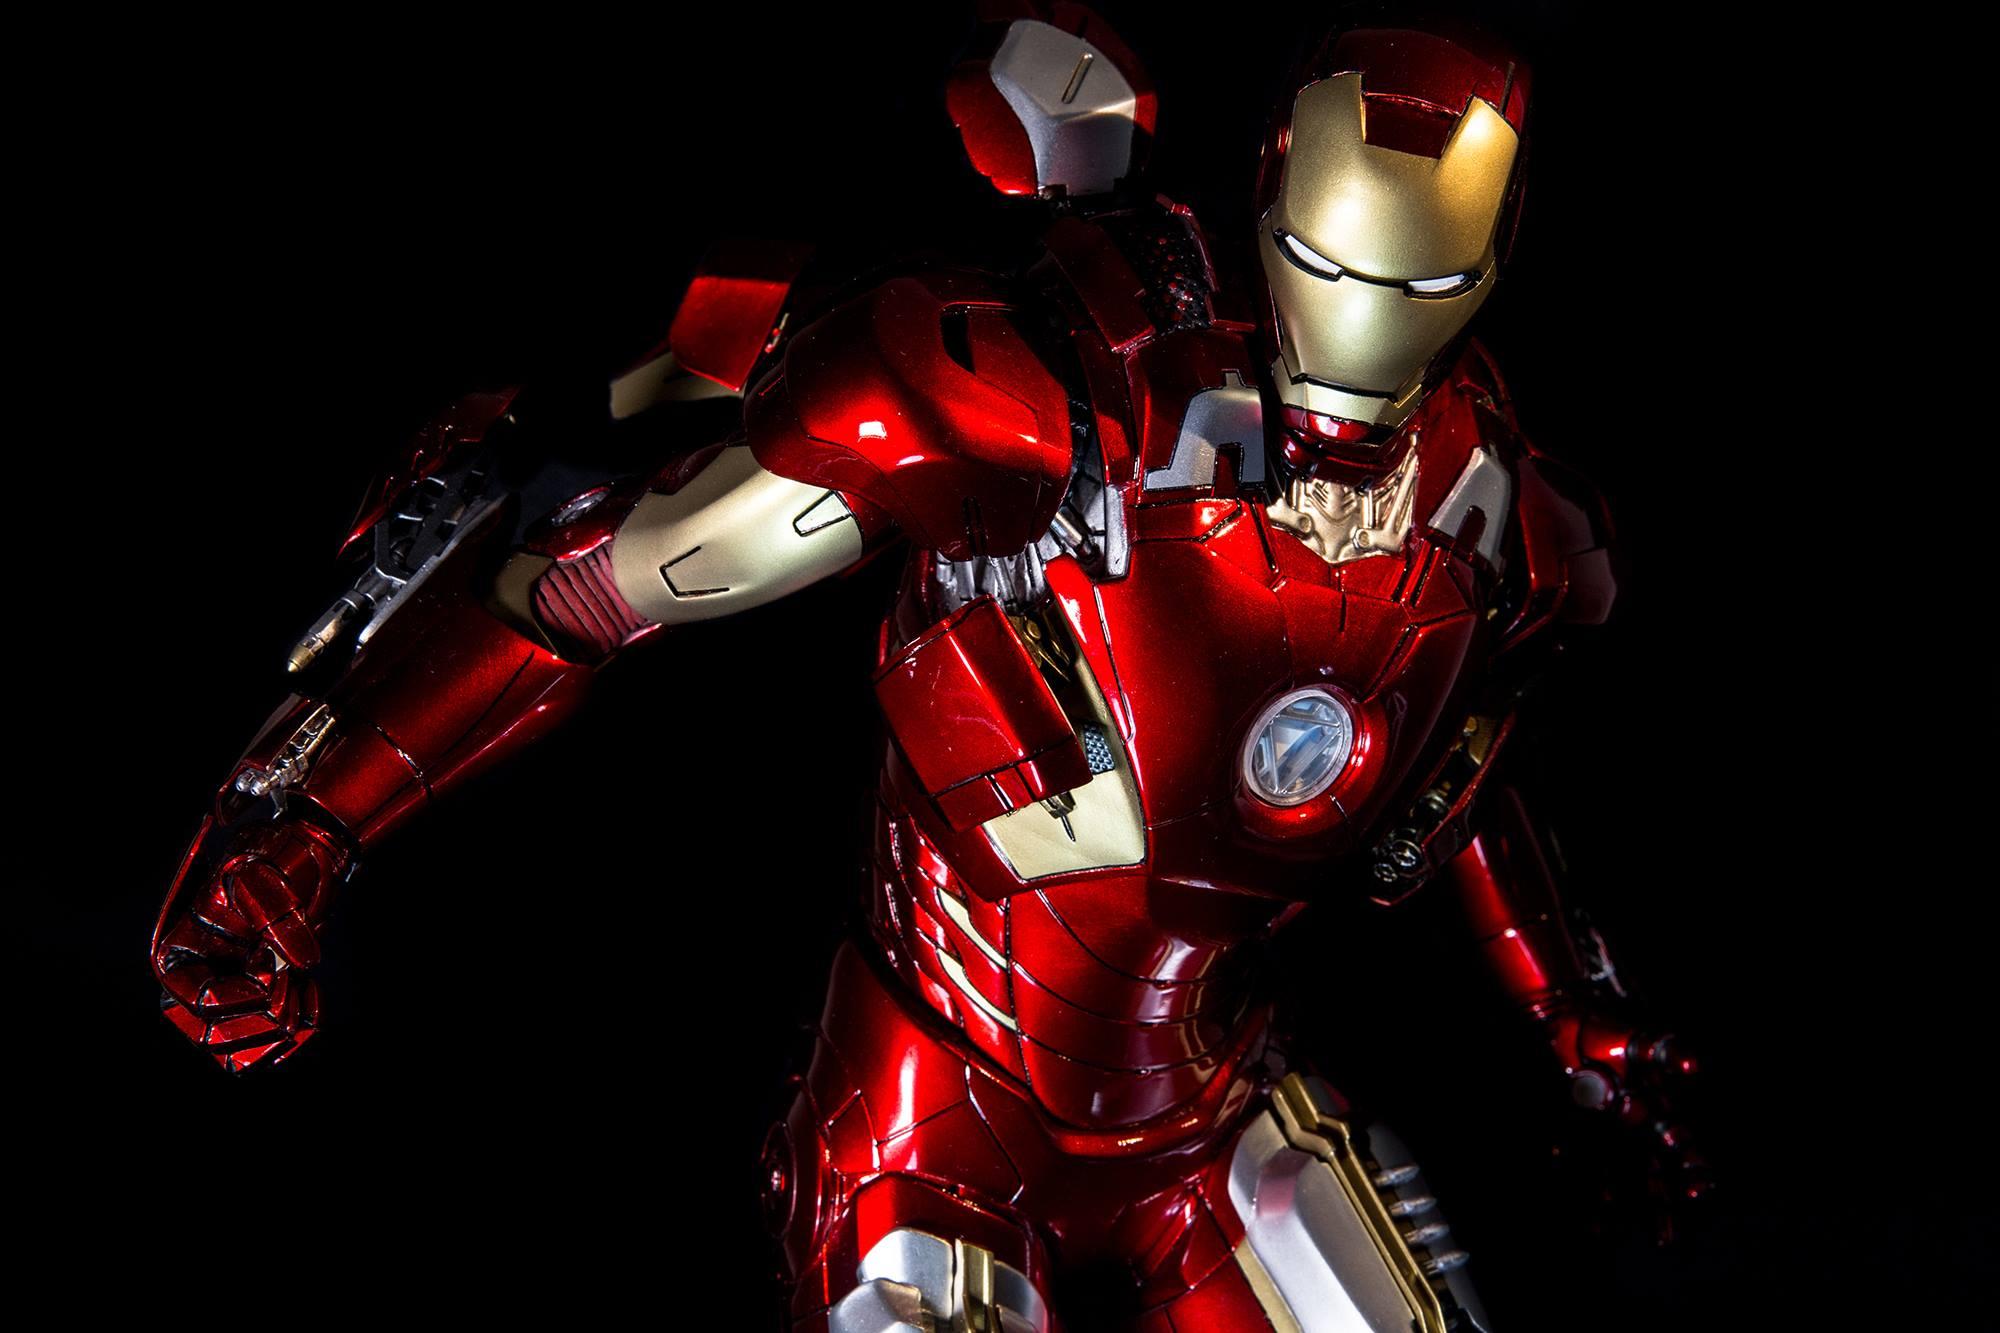 Premium Collectibles : Iron man MK VII - Page 2 9488431056251714035866398620313607021162788695241o